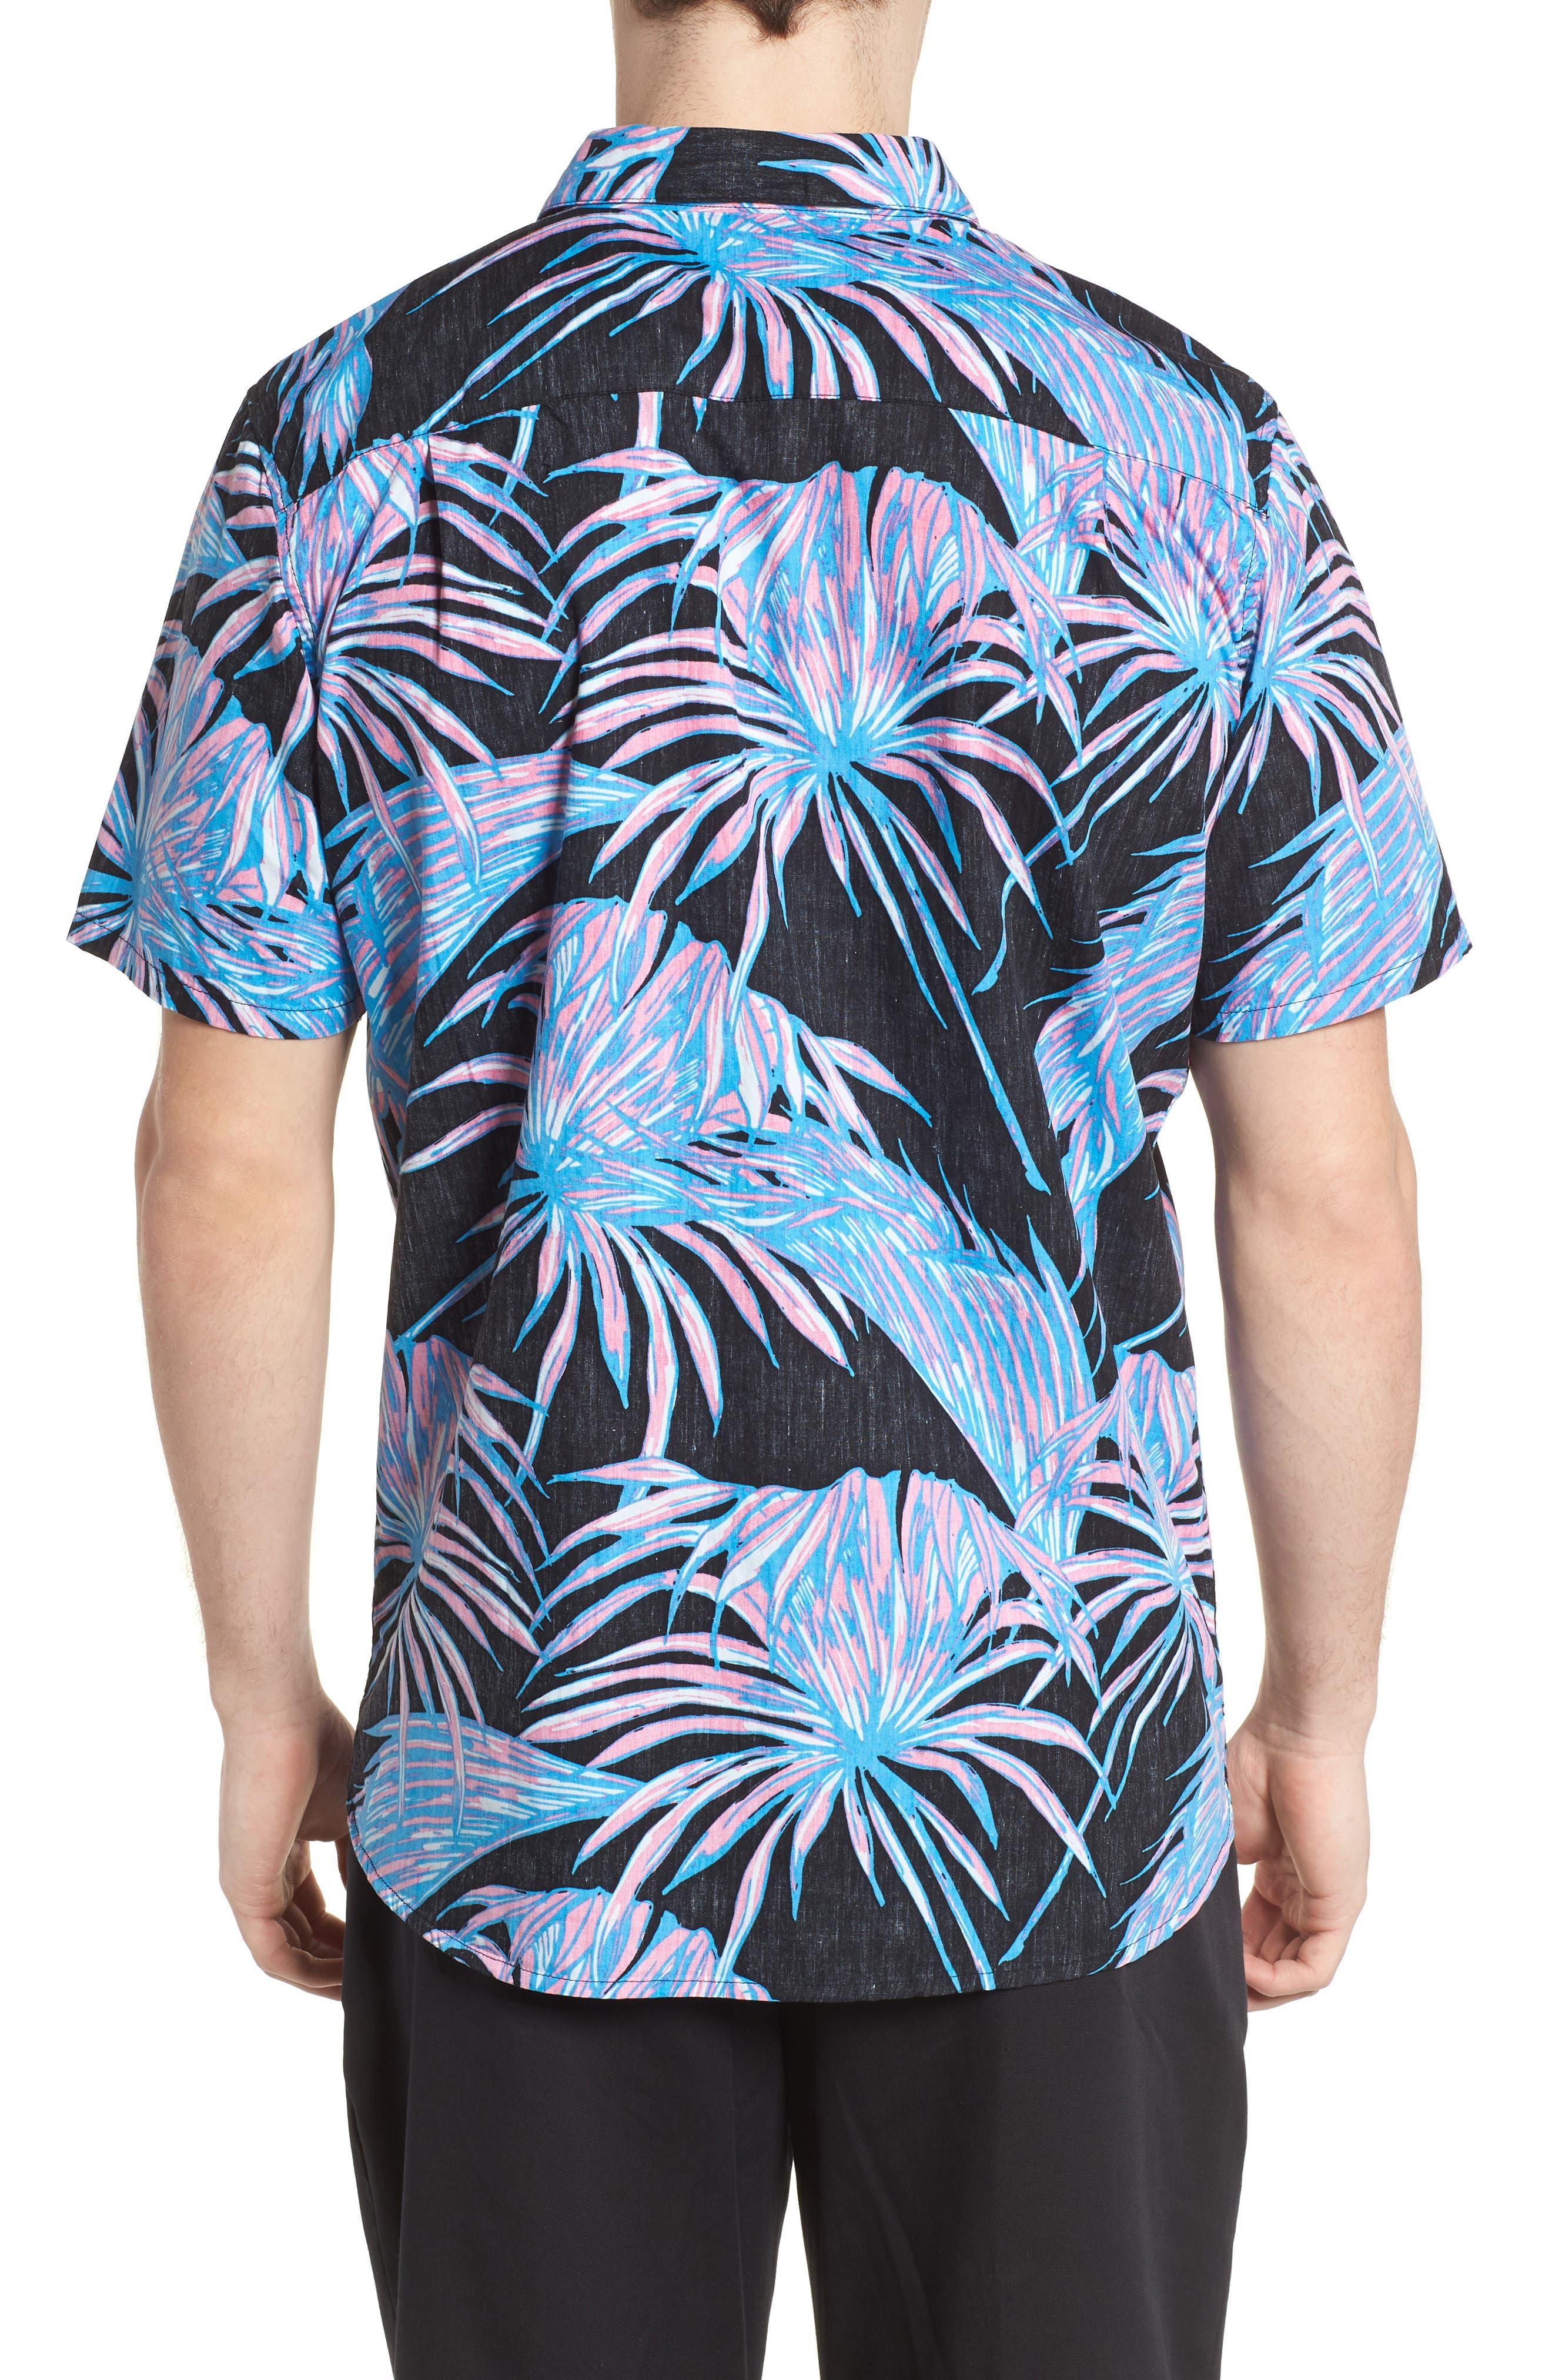 Koko Shirt,                             Alternate thumbnail 2, color,                             010